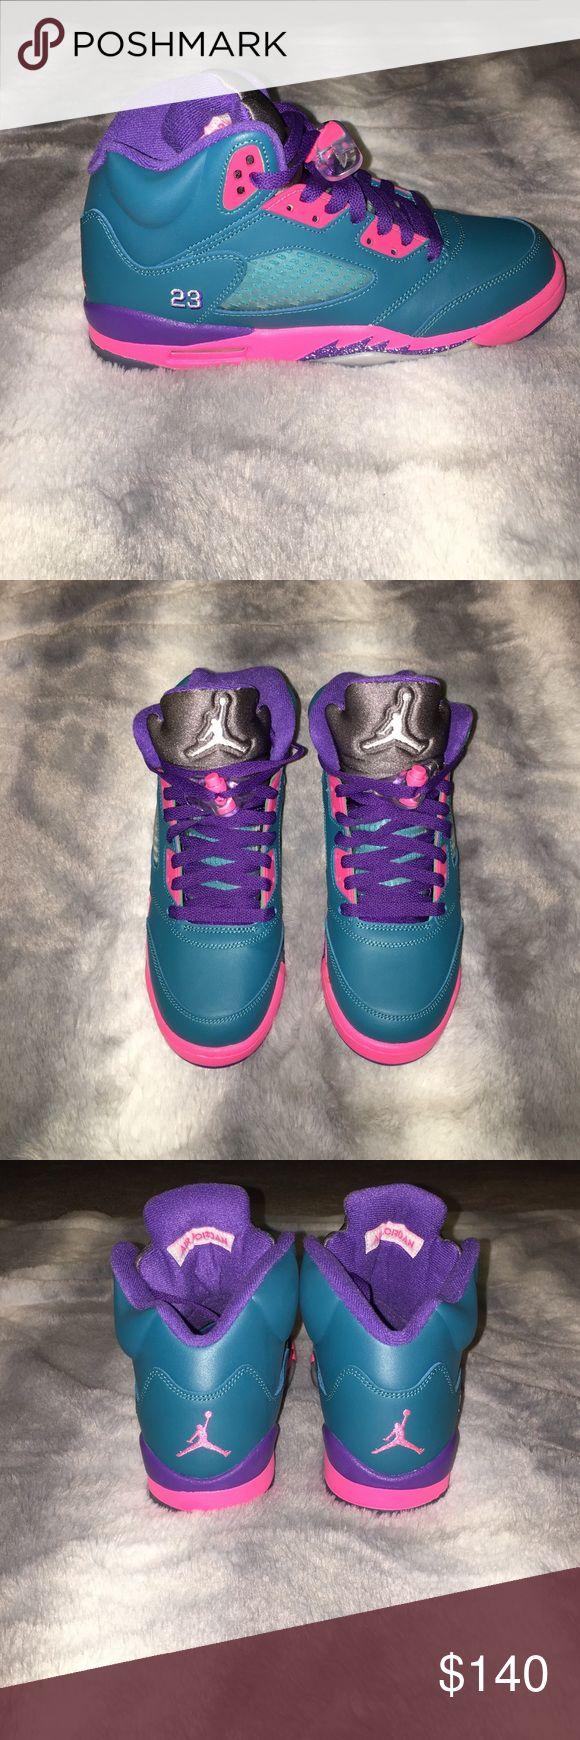 "Brand NEW! Air Jordan Retro 5s ""Tropical Teal"" Brand NEW!! Girls Air Jordan 5s ""Tropical Teal. In BOX and ORIGINAL PACKAGING!!!! Its a size US 6Y, UK 5.5 Jordan Shoes Sneakers"